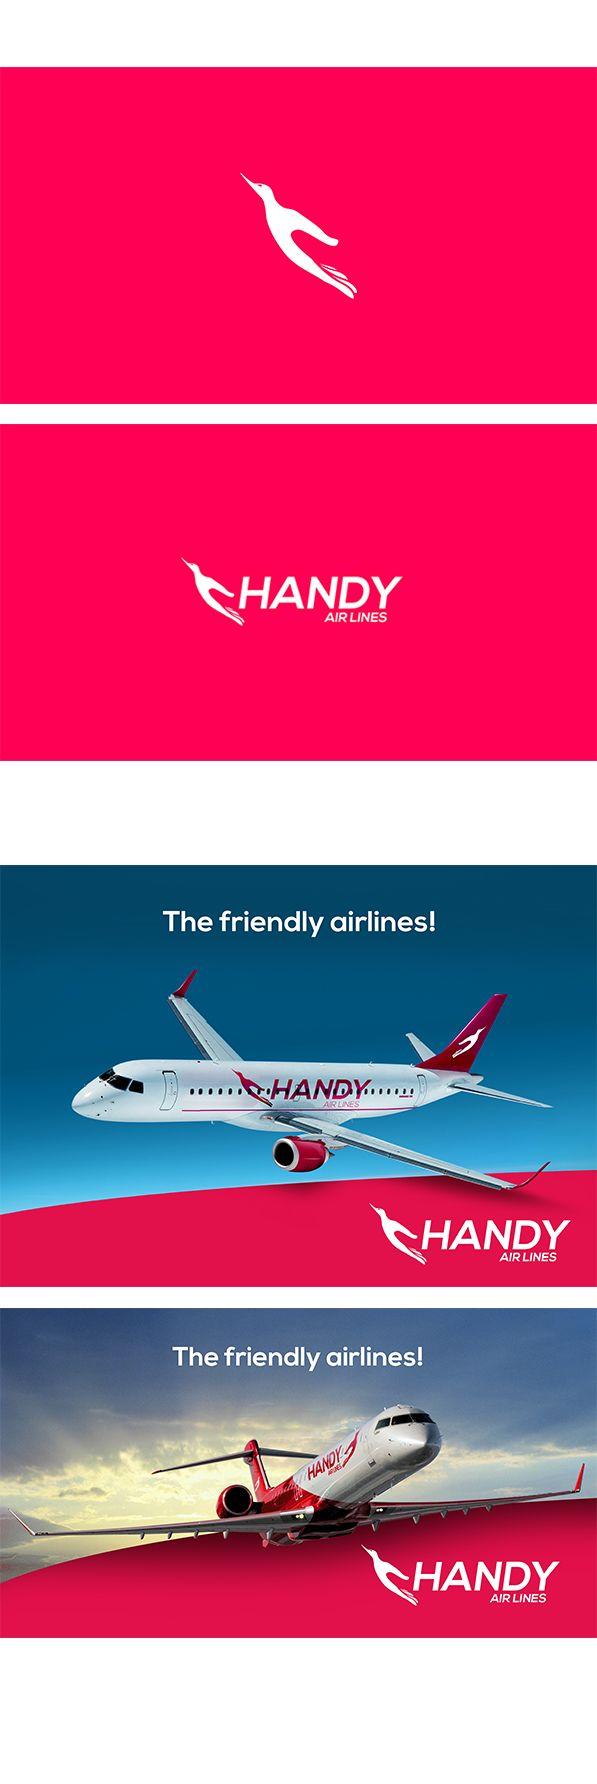 branding of airlines